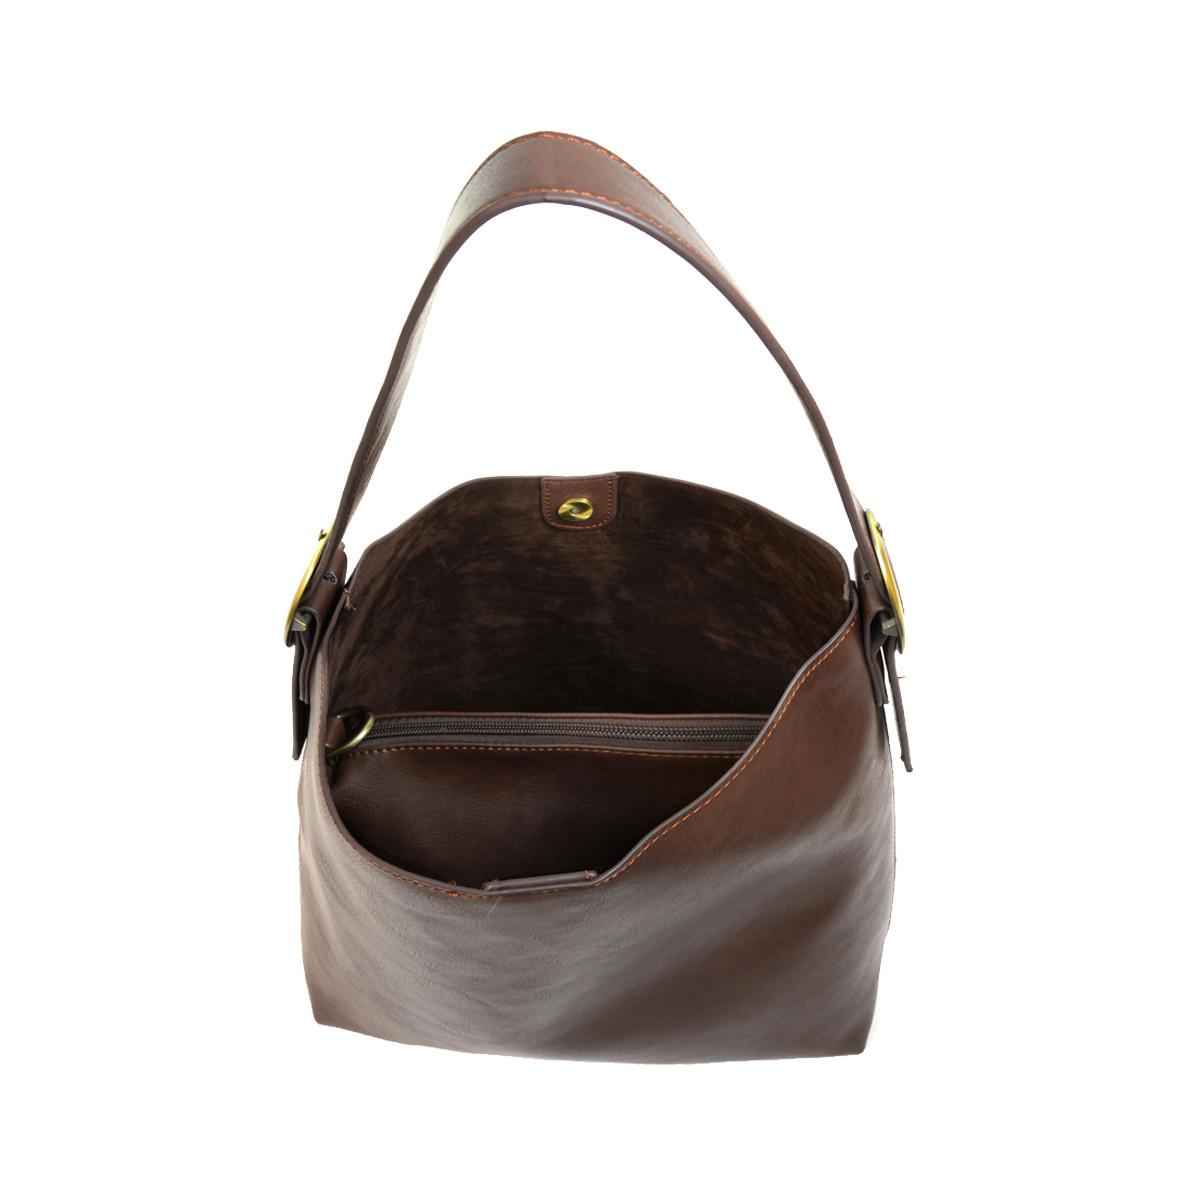 Joy Susan Joy Susan Jillian Hobo Handbag with Tassel Chocolate